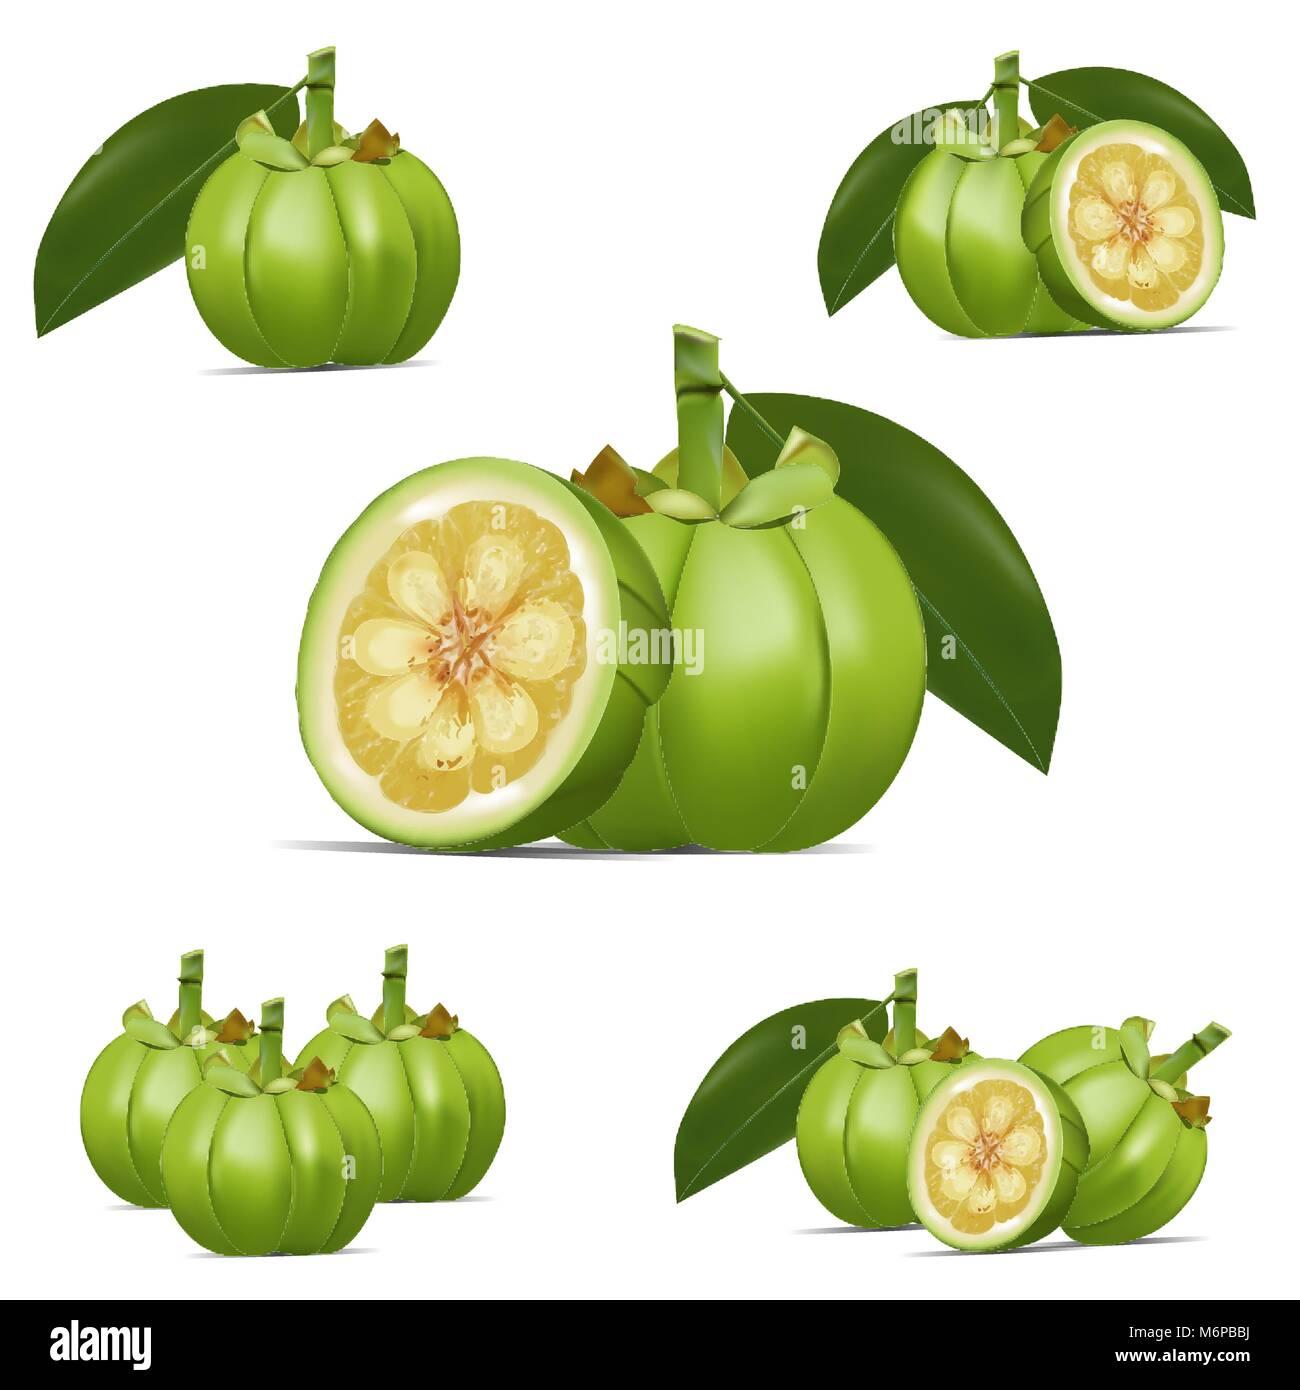 Garcinia Cambogia Fruit Vector Stock Vector Image Art Alamy